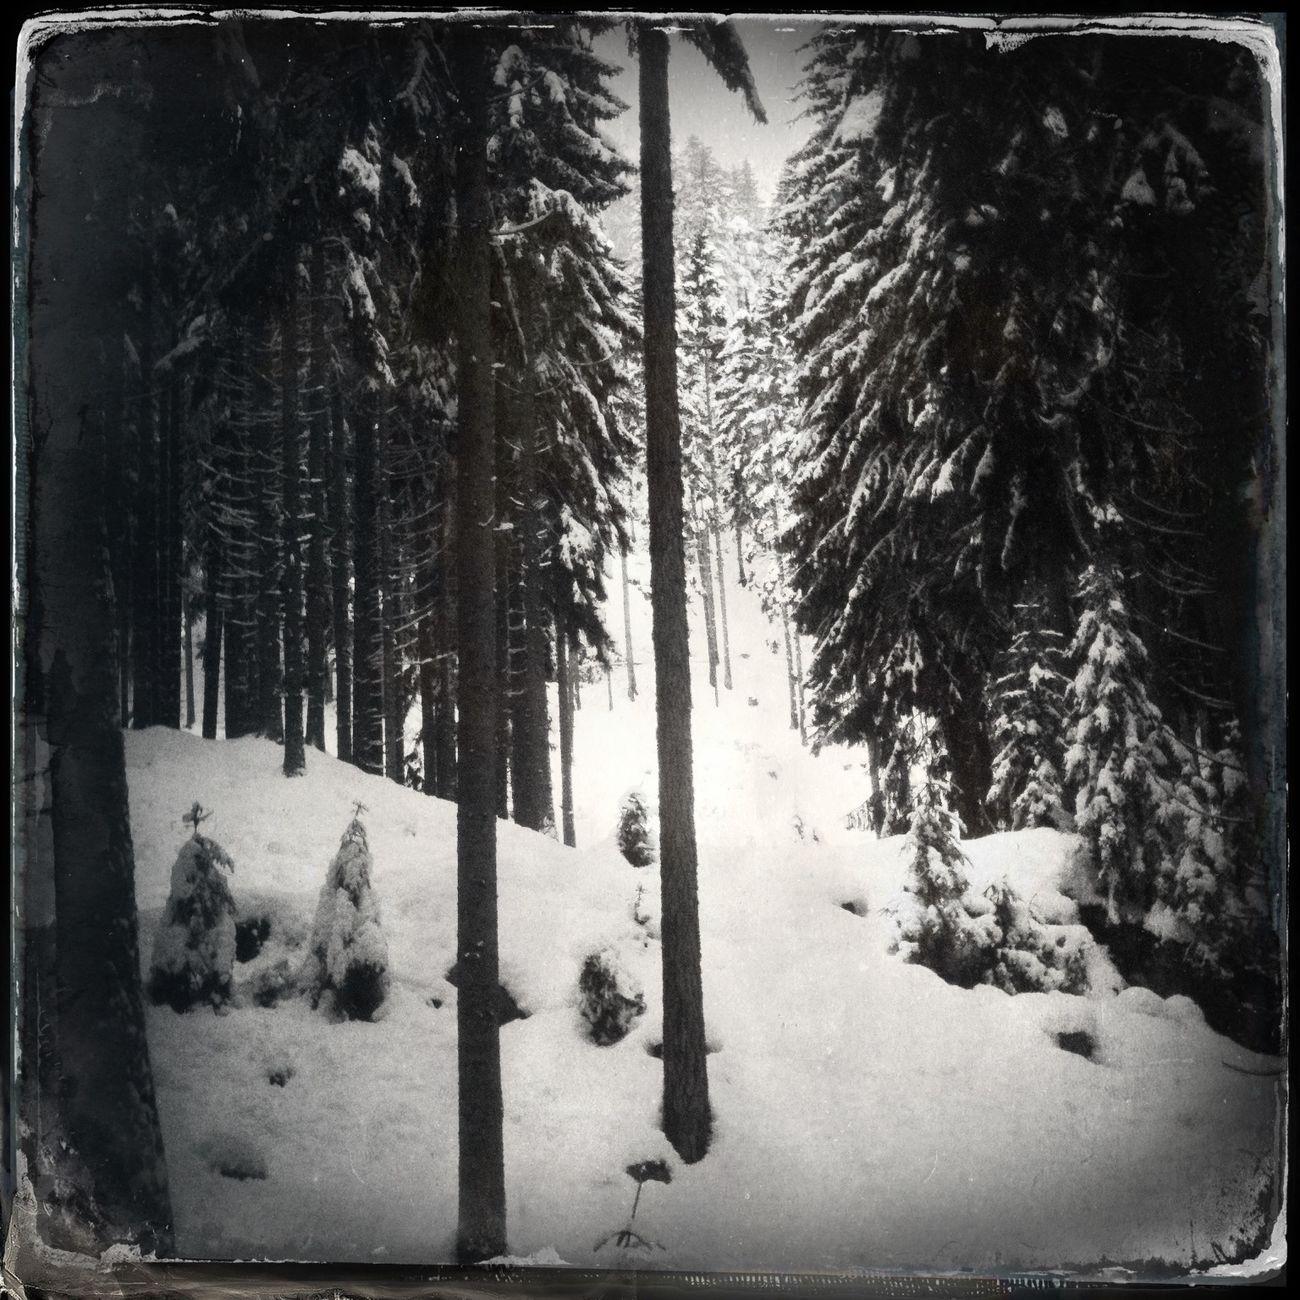 High trees Blackandwhite Hipstamatic Trees The_guido